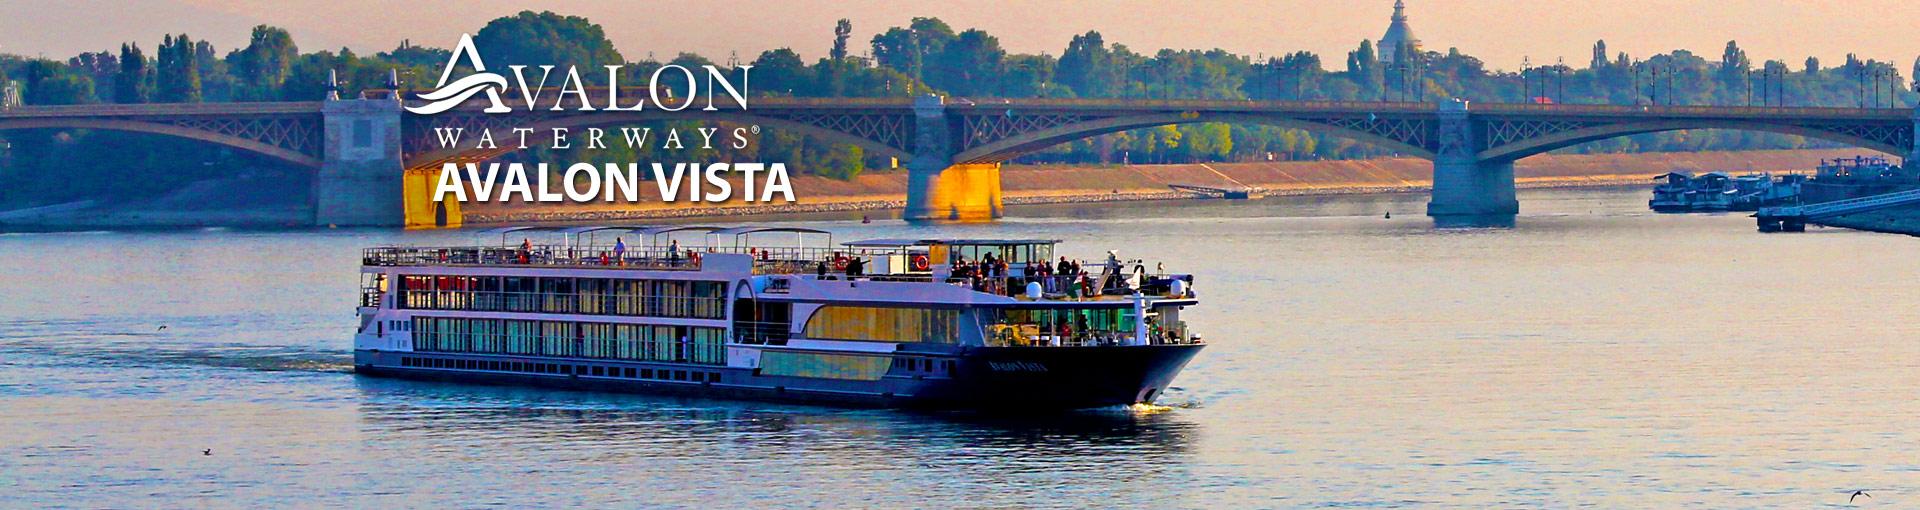 Avalon Waterways Vista river cruise ship